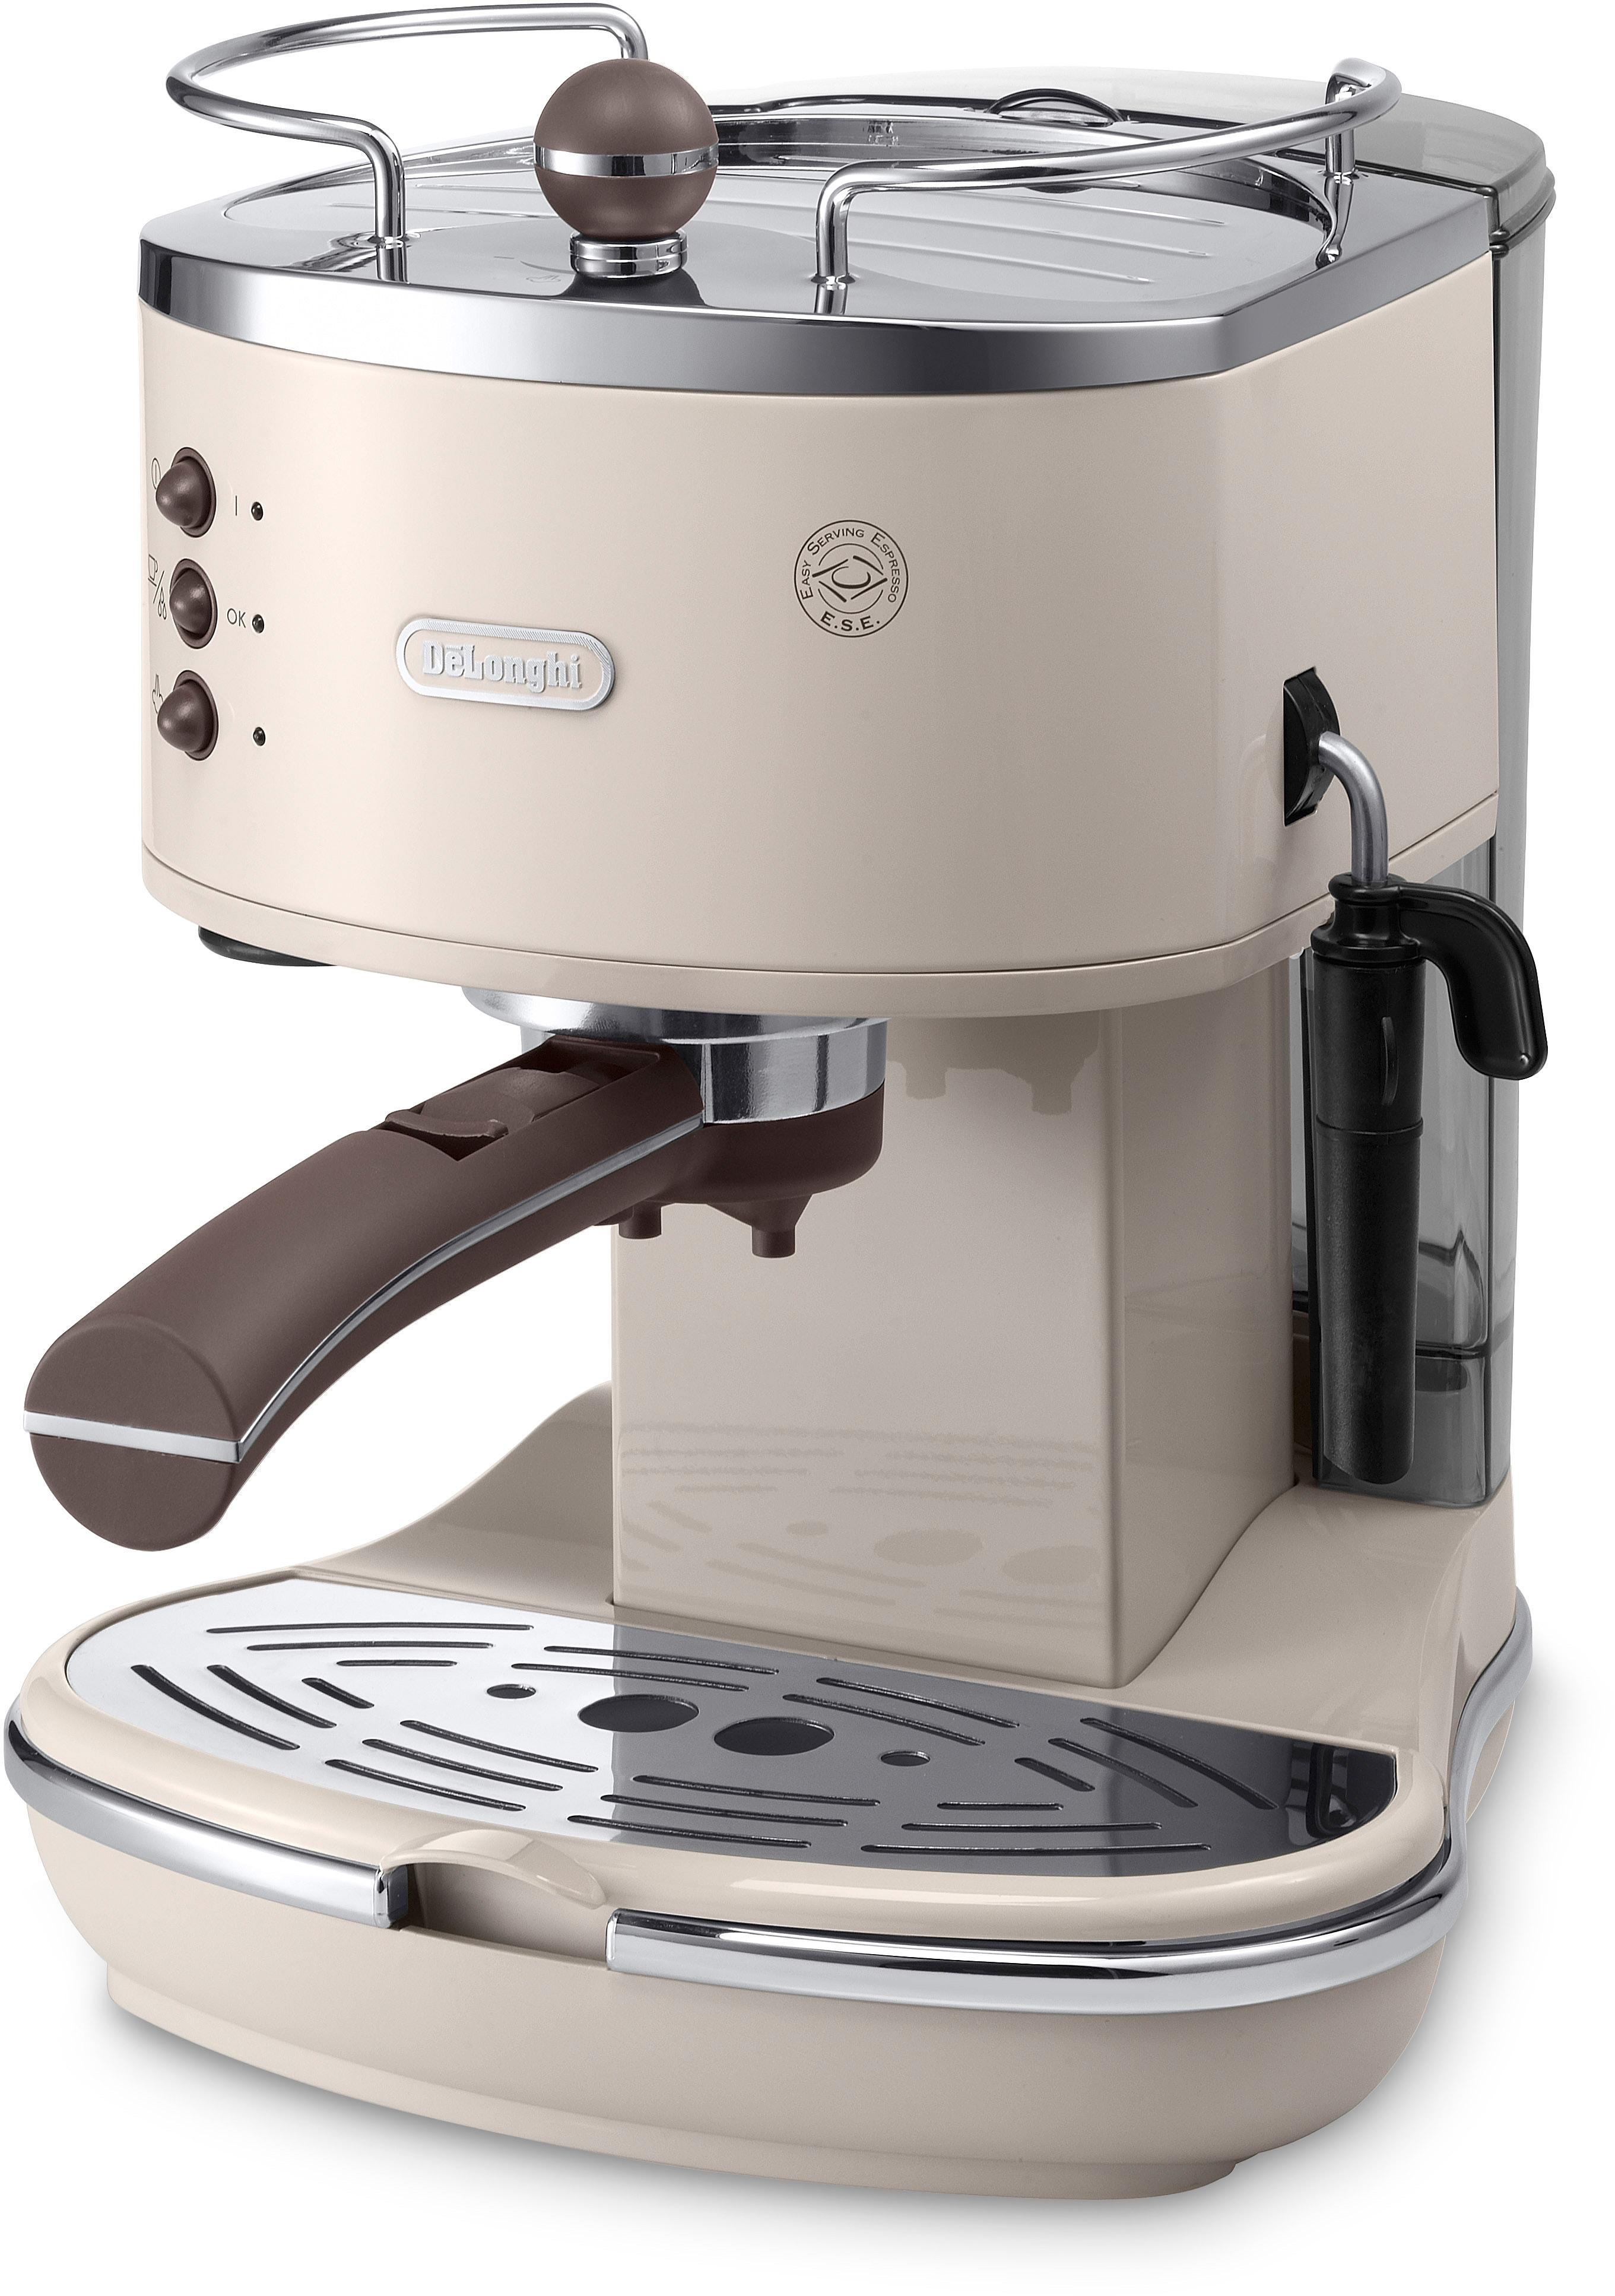 De'longhi Espresso-apparaat ECOV 311.BG veilig op otto.nl kopen